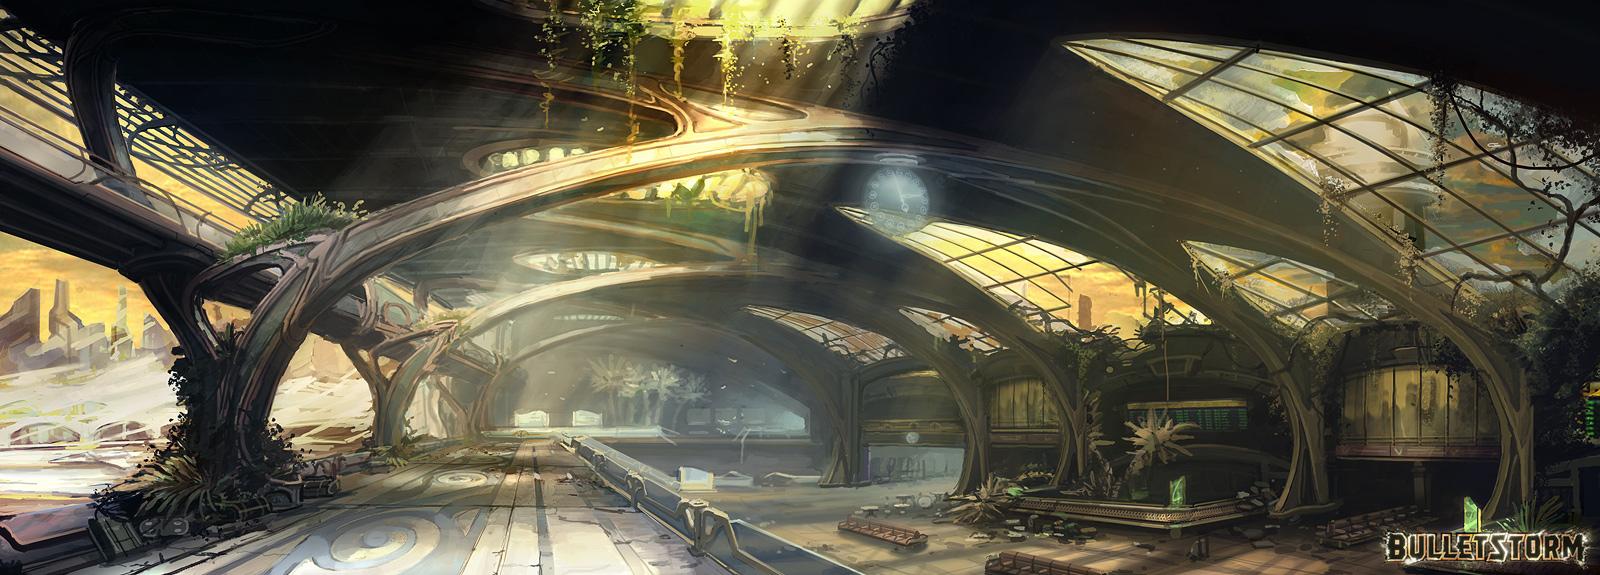 Spaceport by M-Wojtala